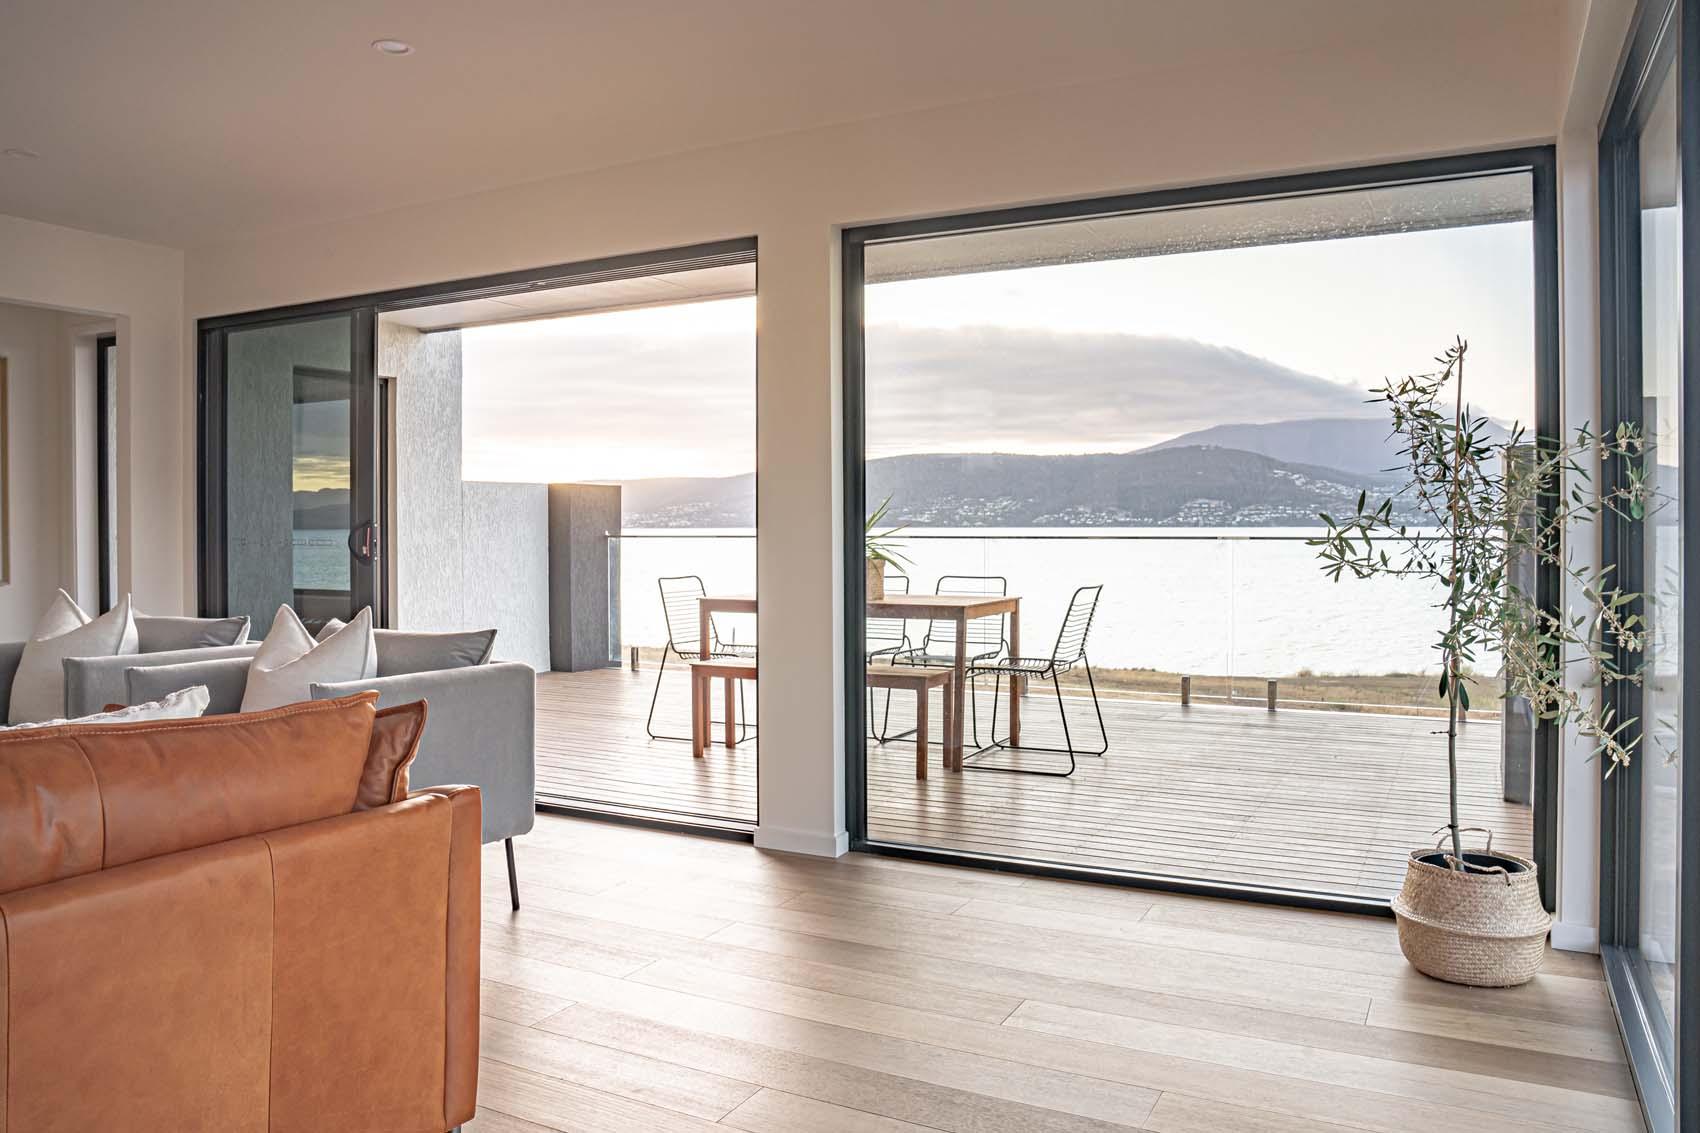 andrew-lyden-new-home-builder-hobart-tasmania-cambridge-4